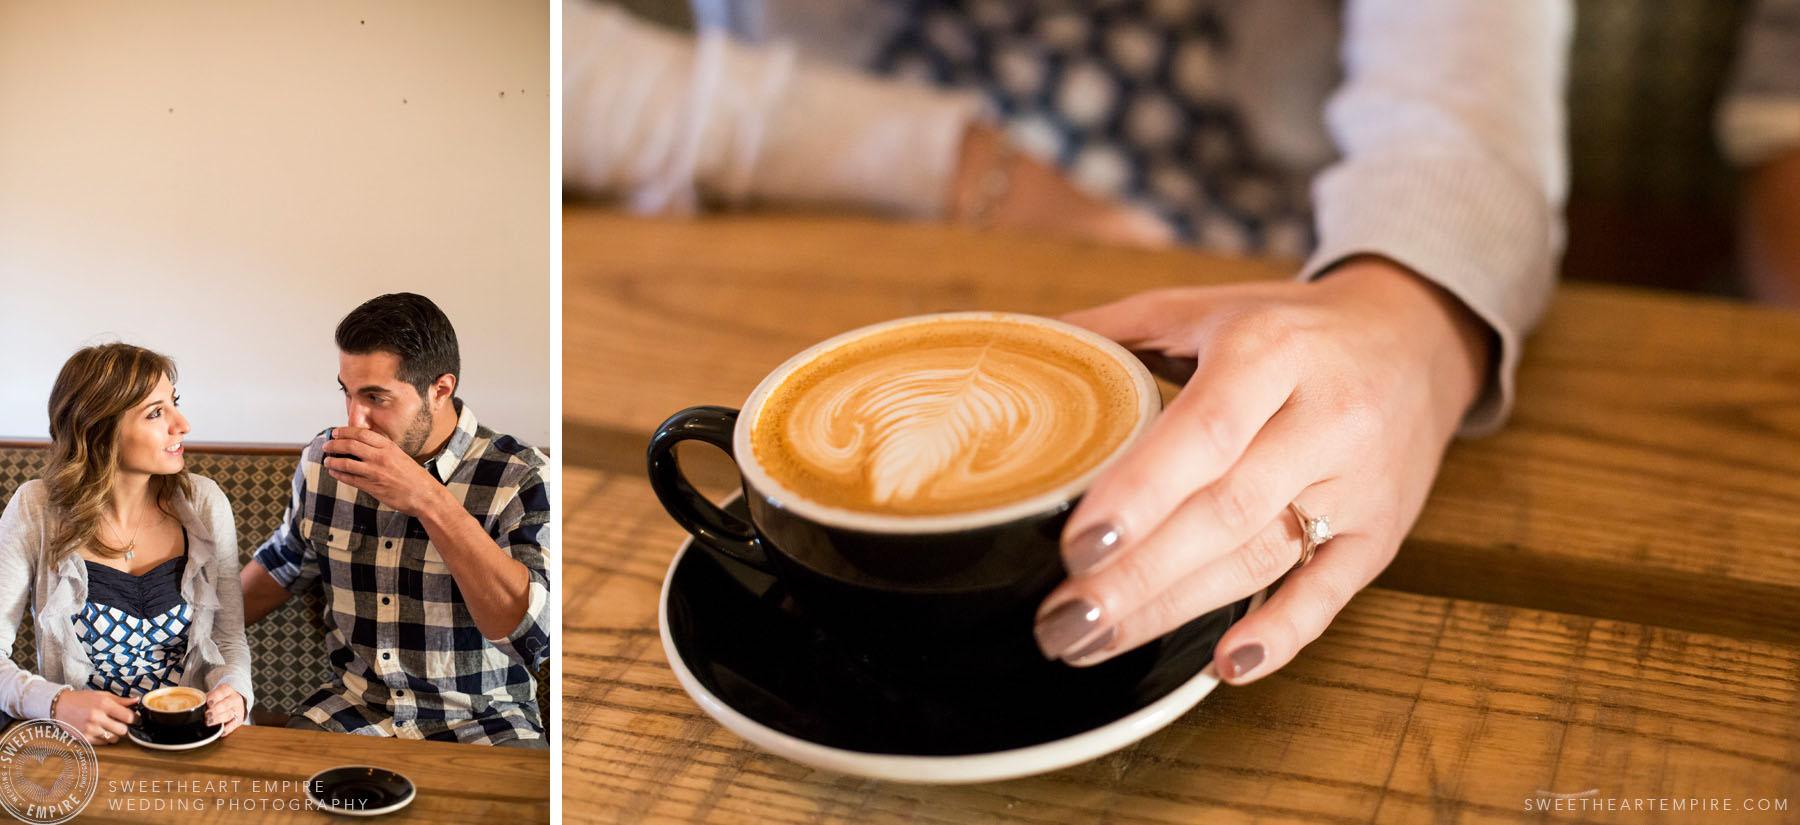 12_Boxcar-Social-Cafe-Engagement-Photos